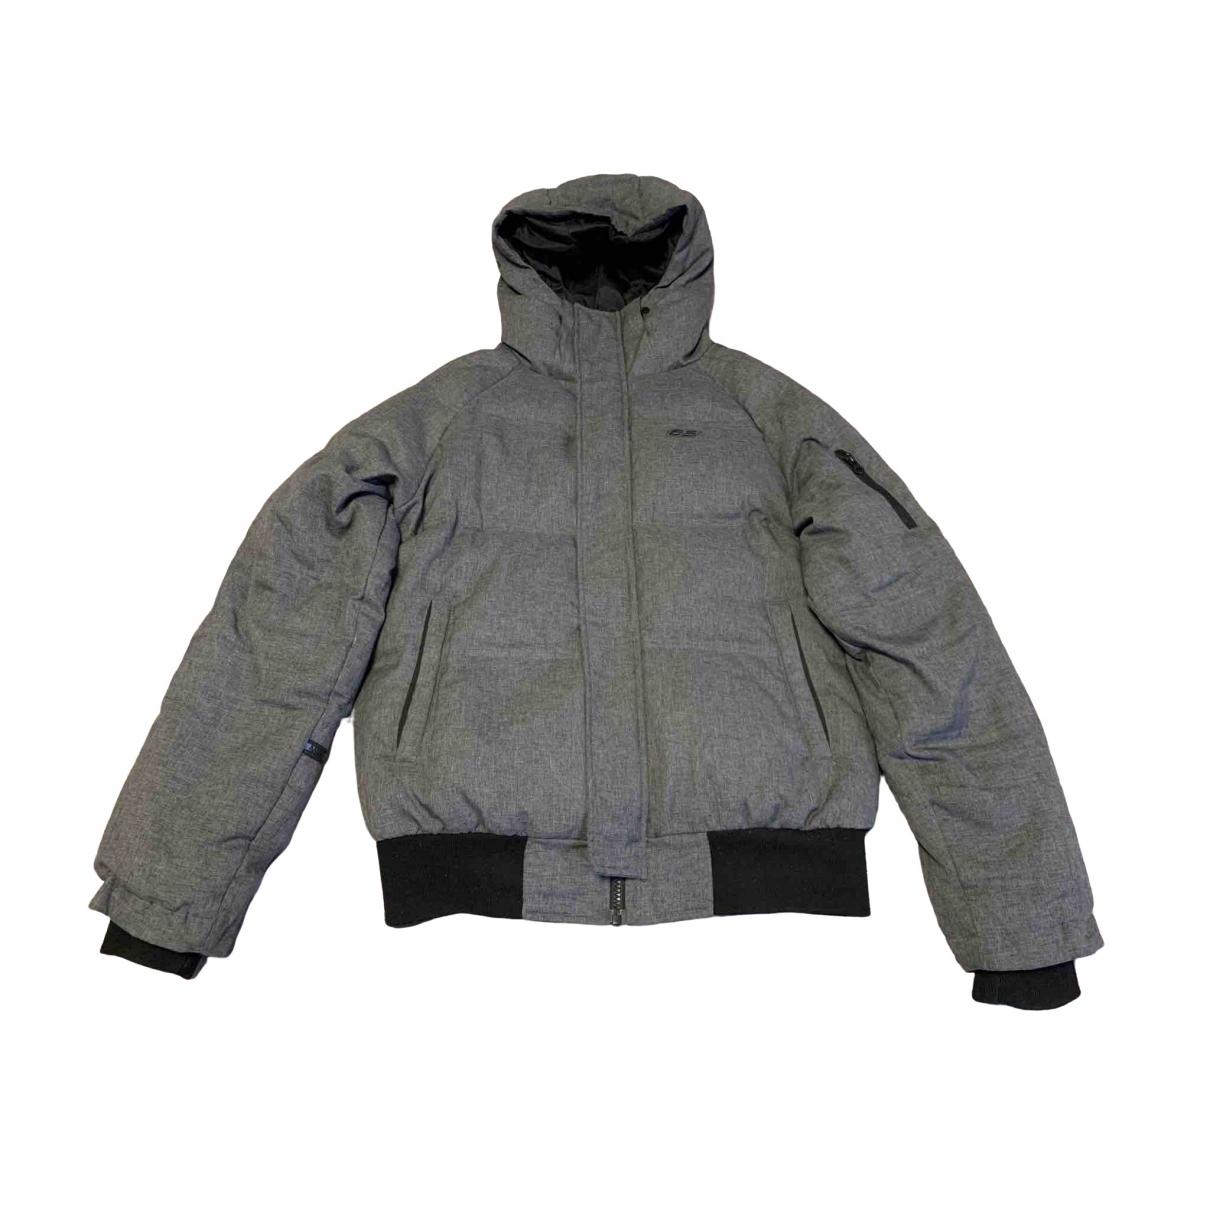 Diesel \N Anthracite jacket  for Men S International